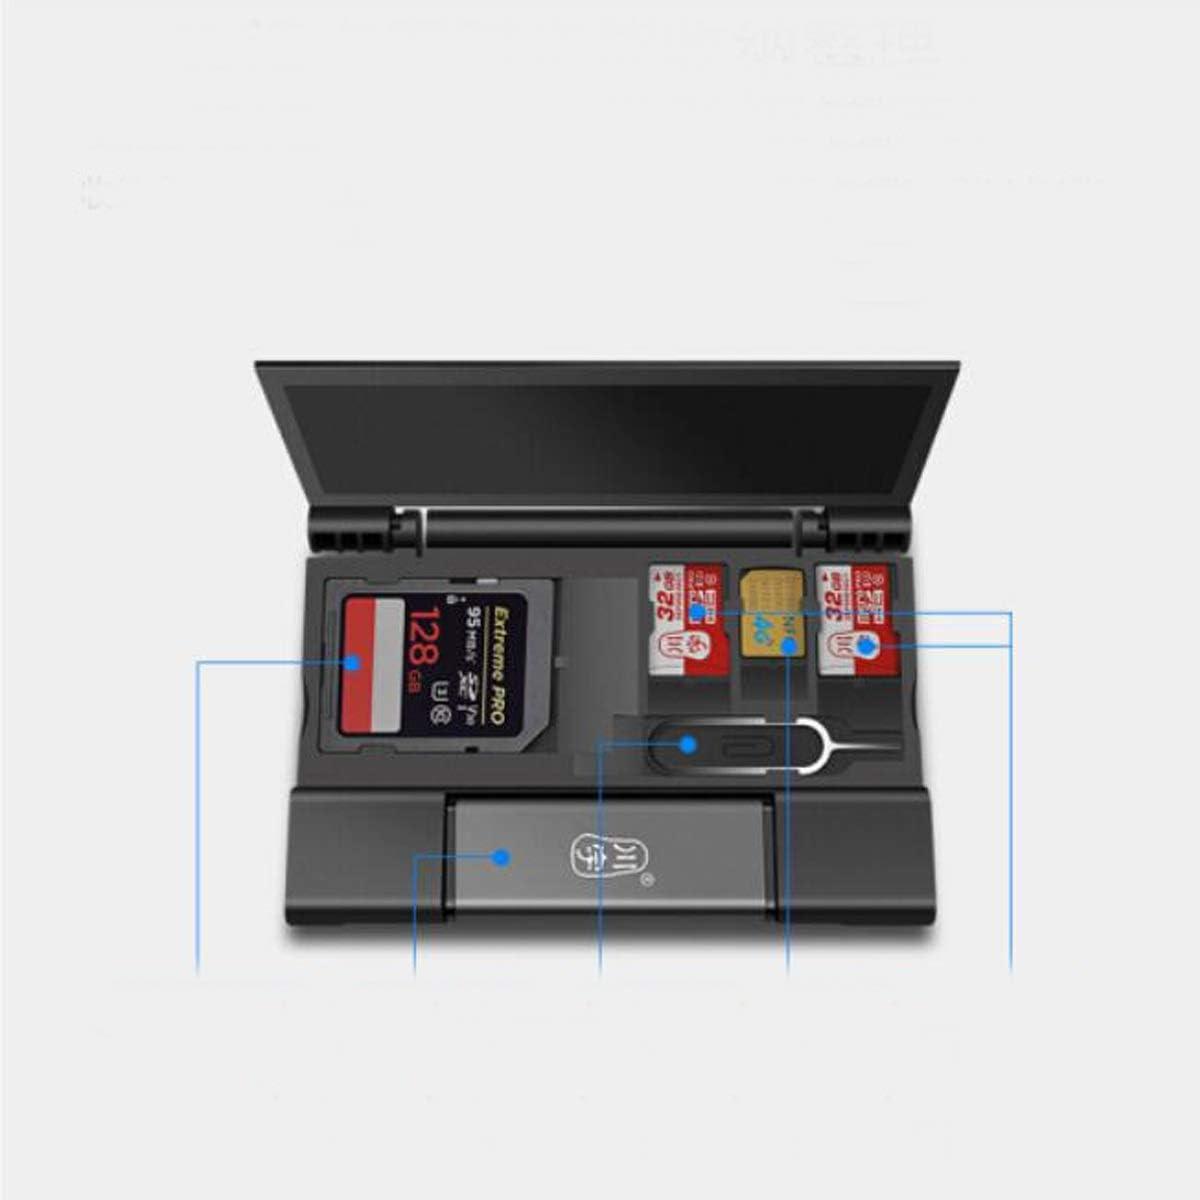 USB-C3.0 High Speed Multi-Function Mobile Phone Card Reader Color : Black Qiyuezhuangshi Card Reader